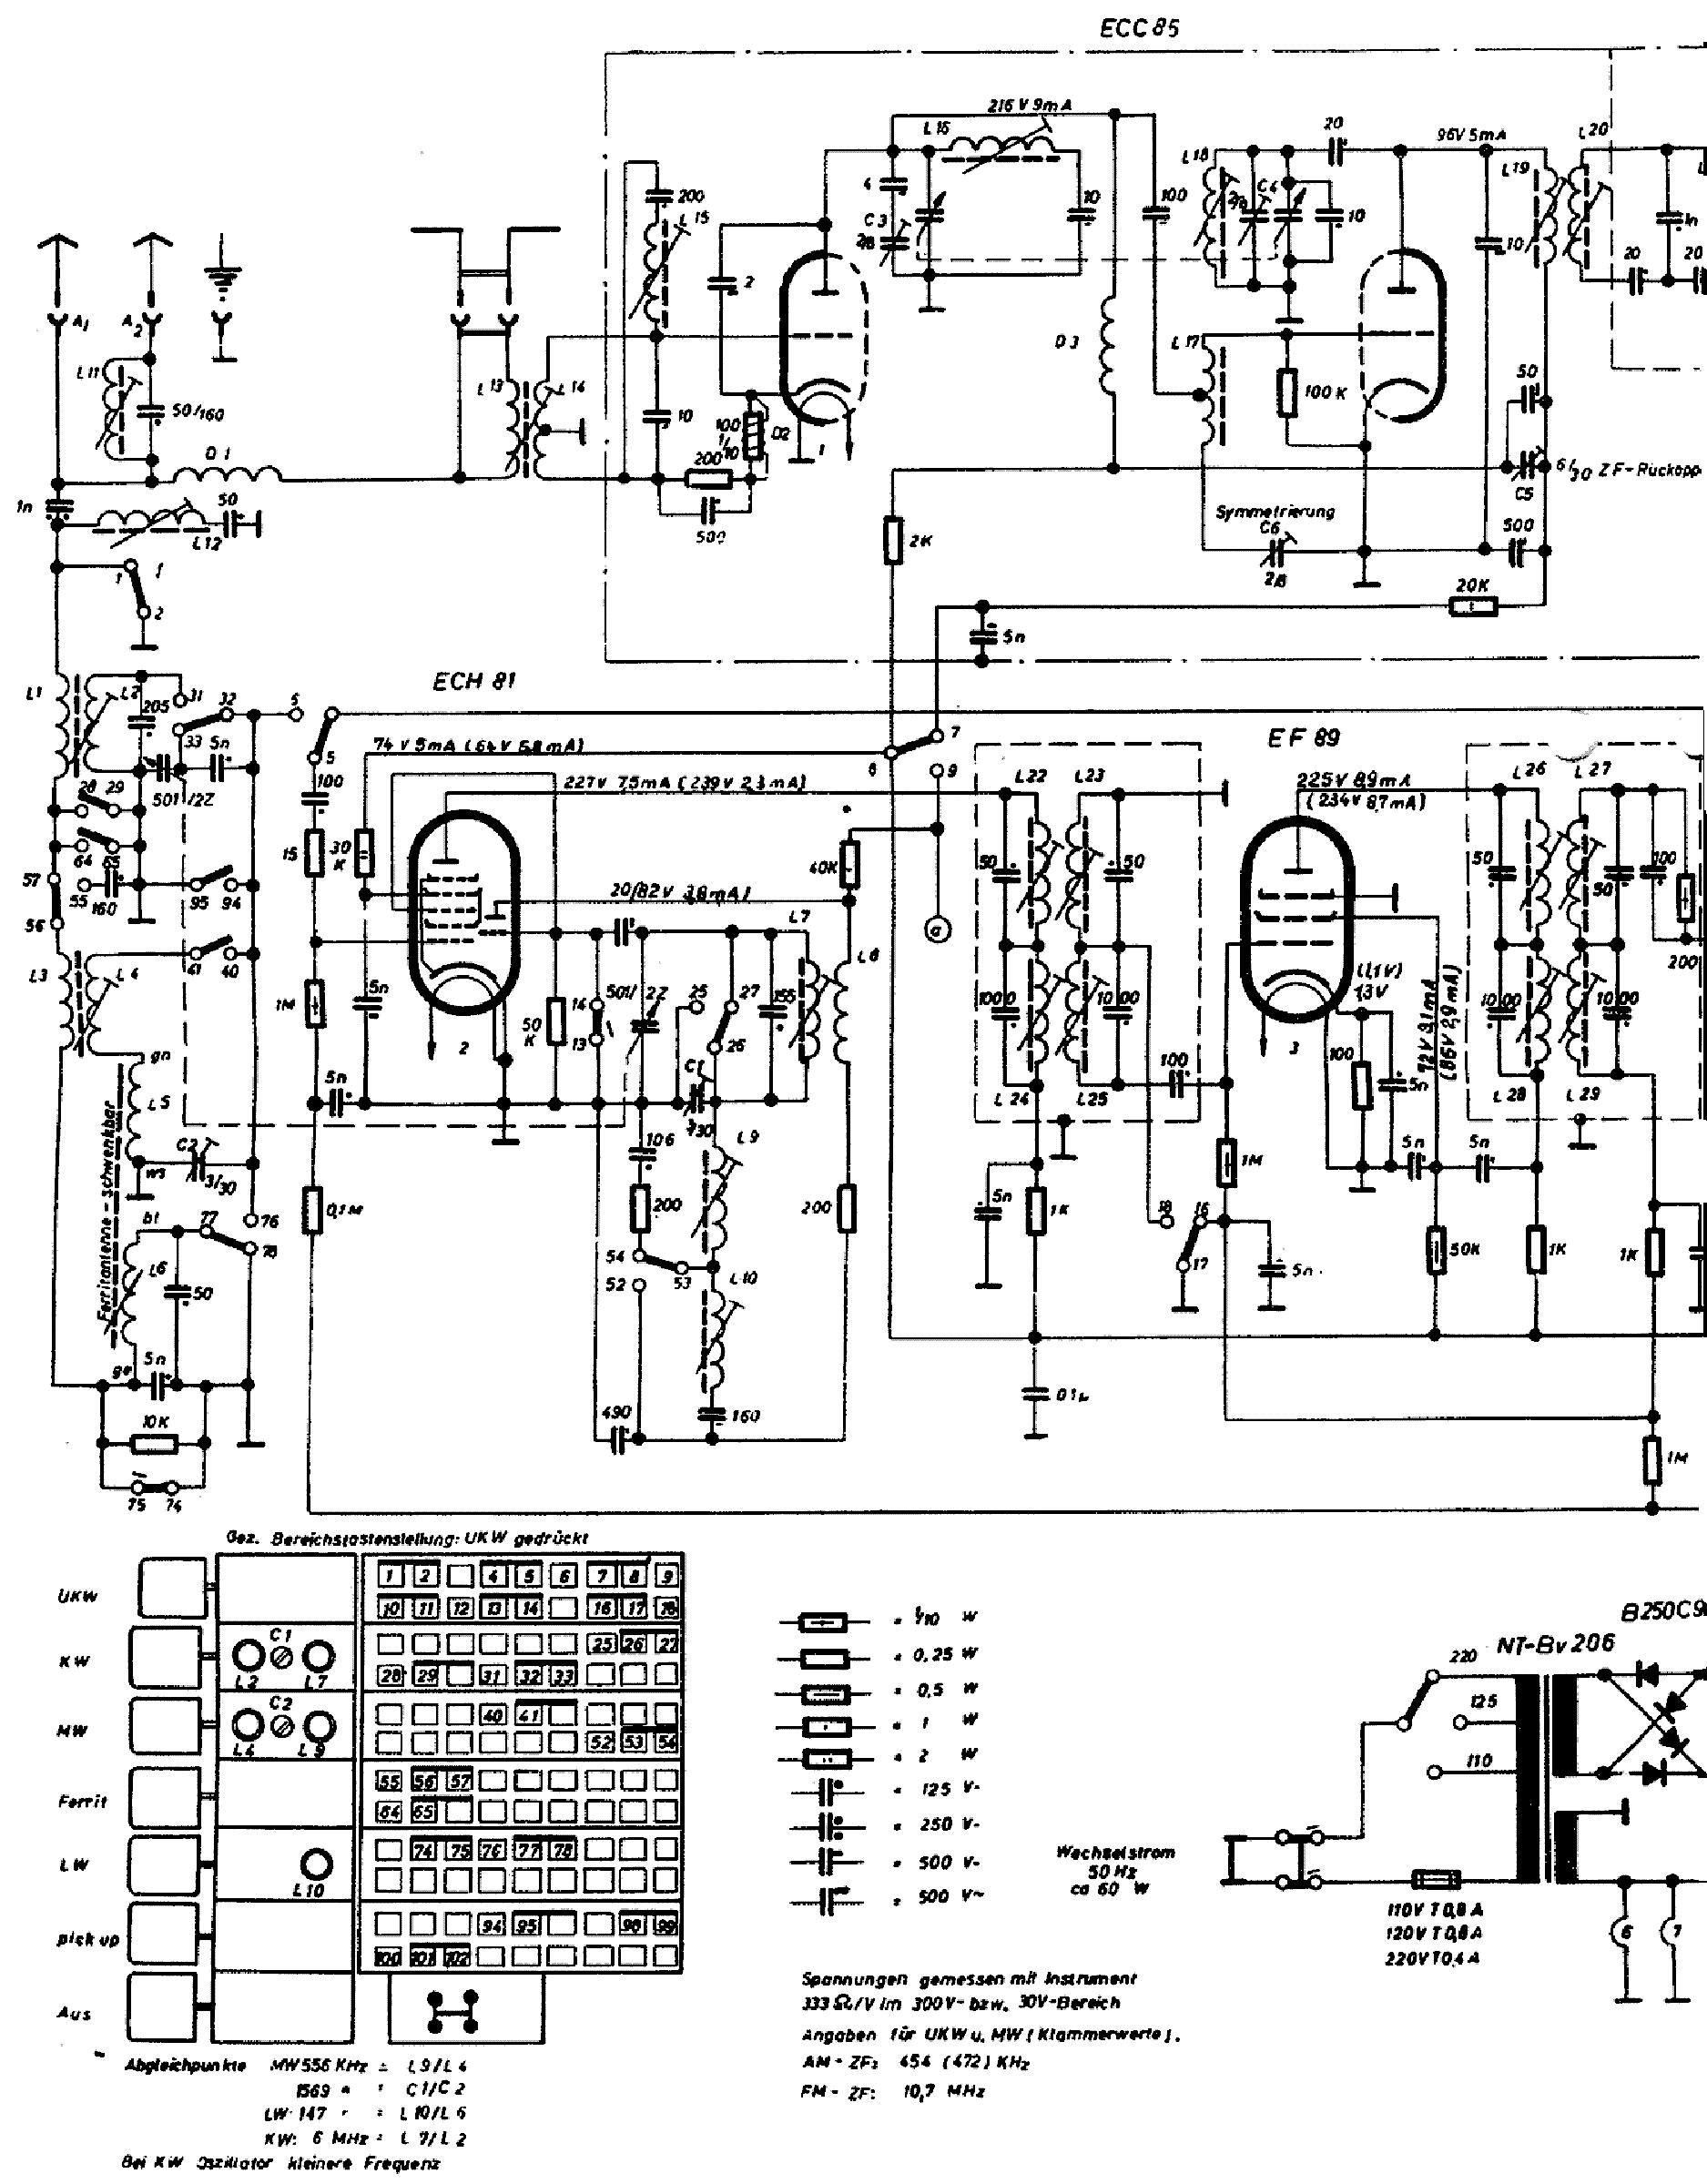 IMPERIAL CONTINENTAL-RUNDFUNK J 349W AM-FM RADIO 1954 SCH